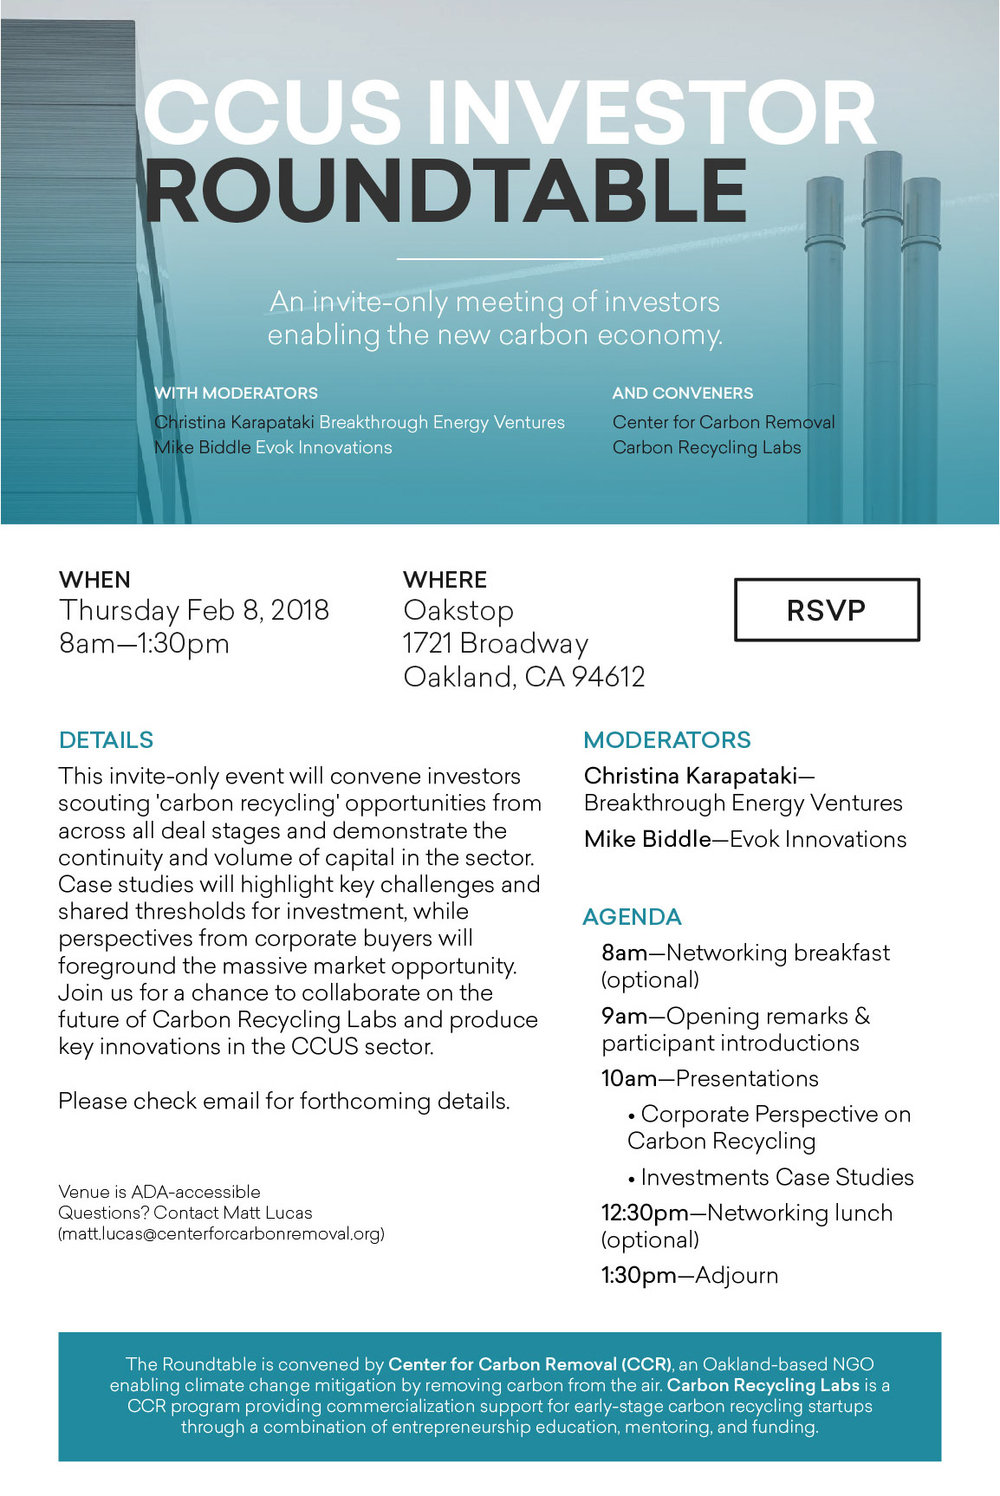 CCUS-Investor-Roundtable_invite.jpg